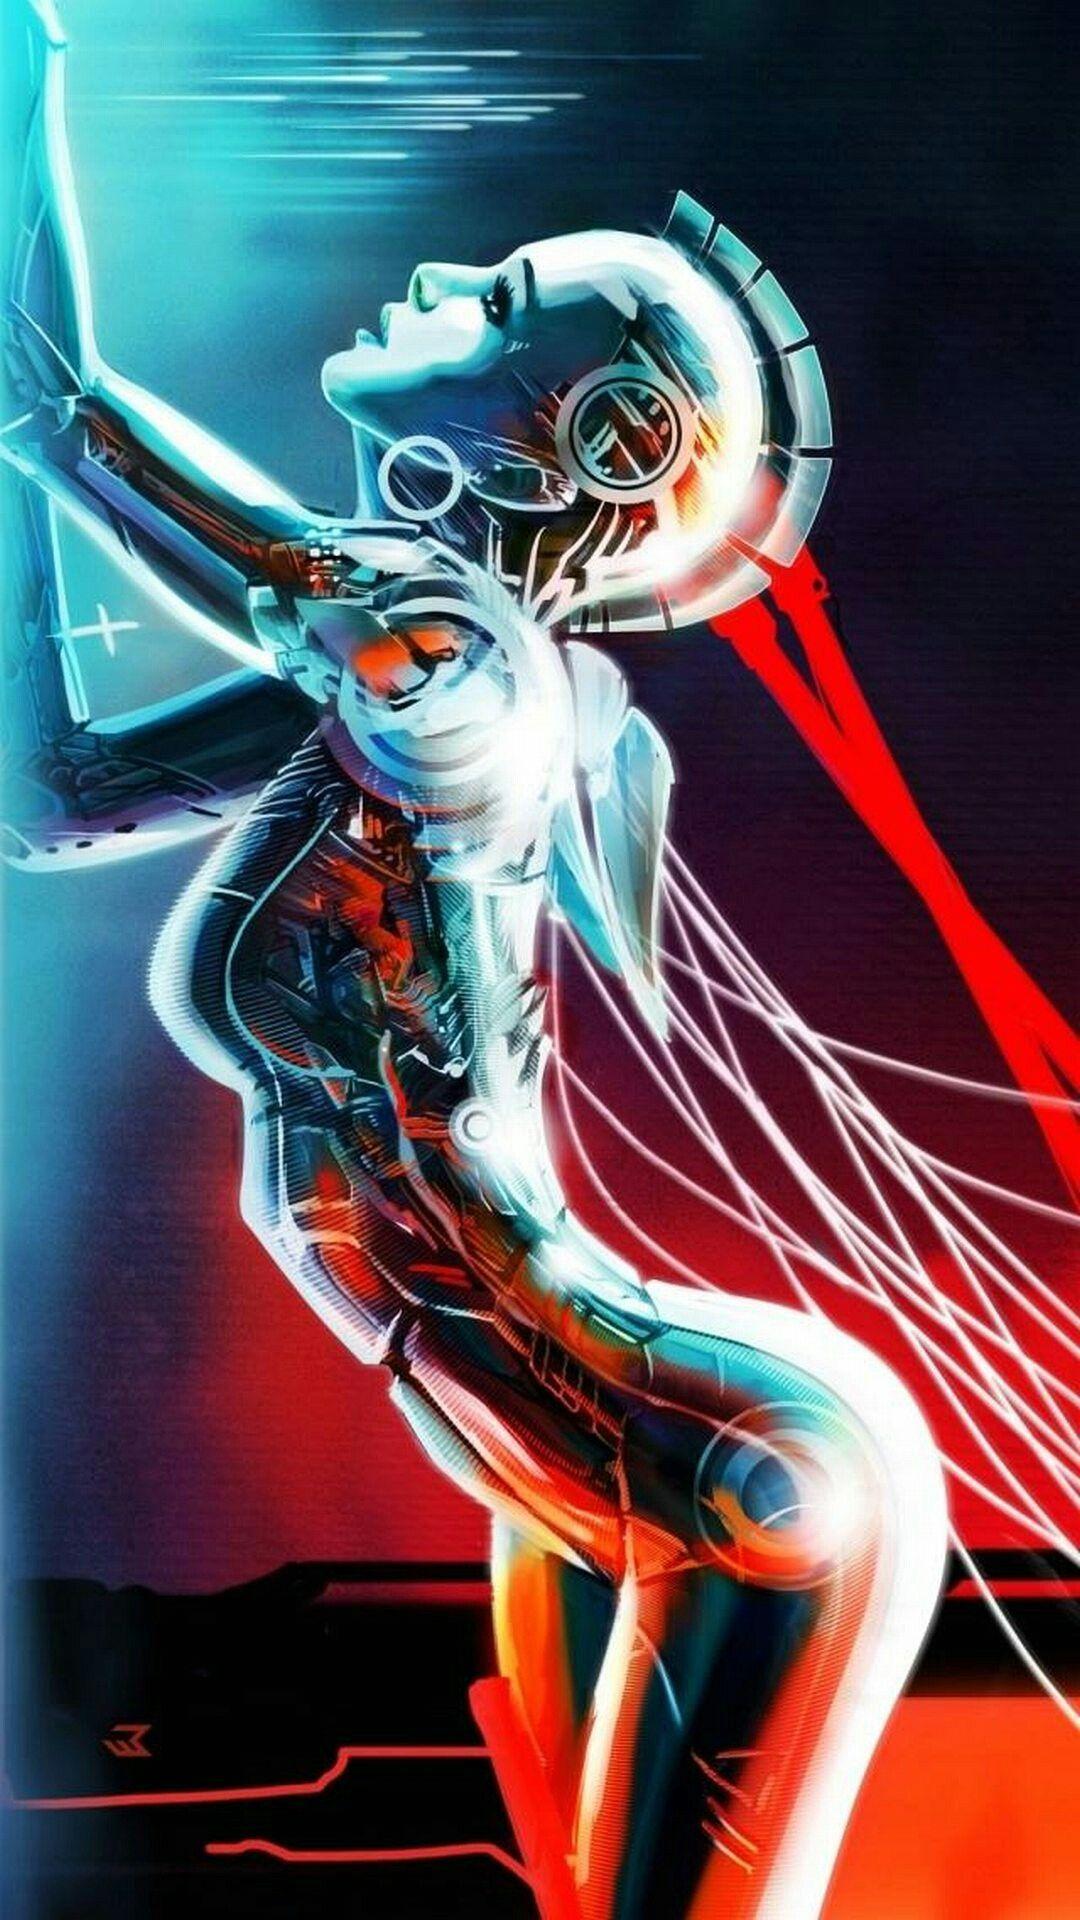 Pin by BTP1524 on wallpapers Cyberpunk girl, Wallpaper